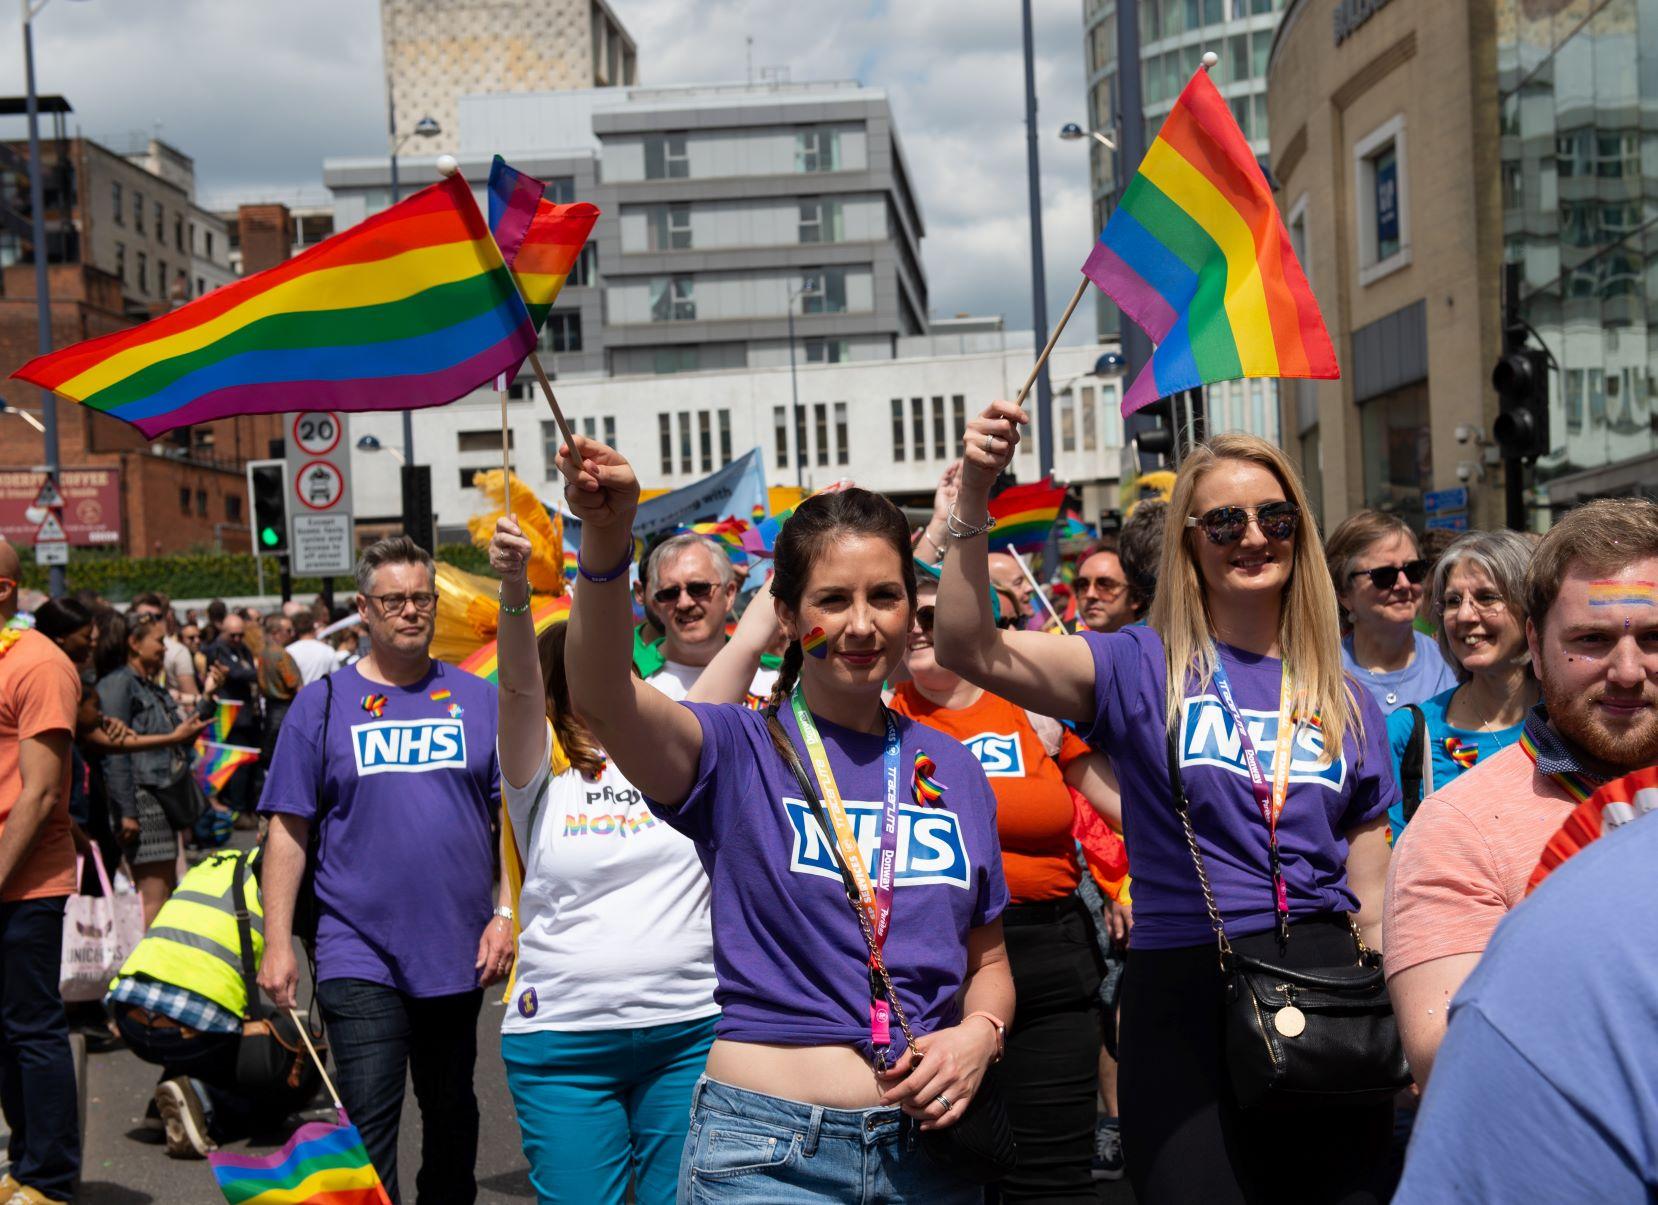 Representatives of the NHS taking part in the parade kickstarting Birmingham Pride